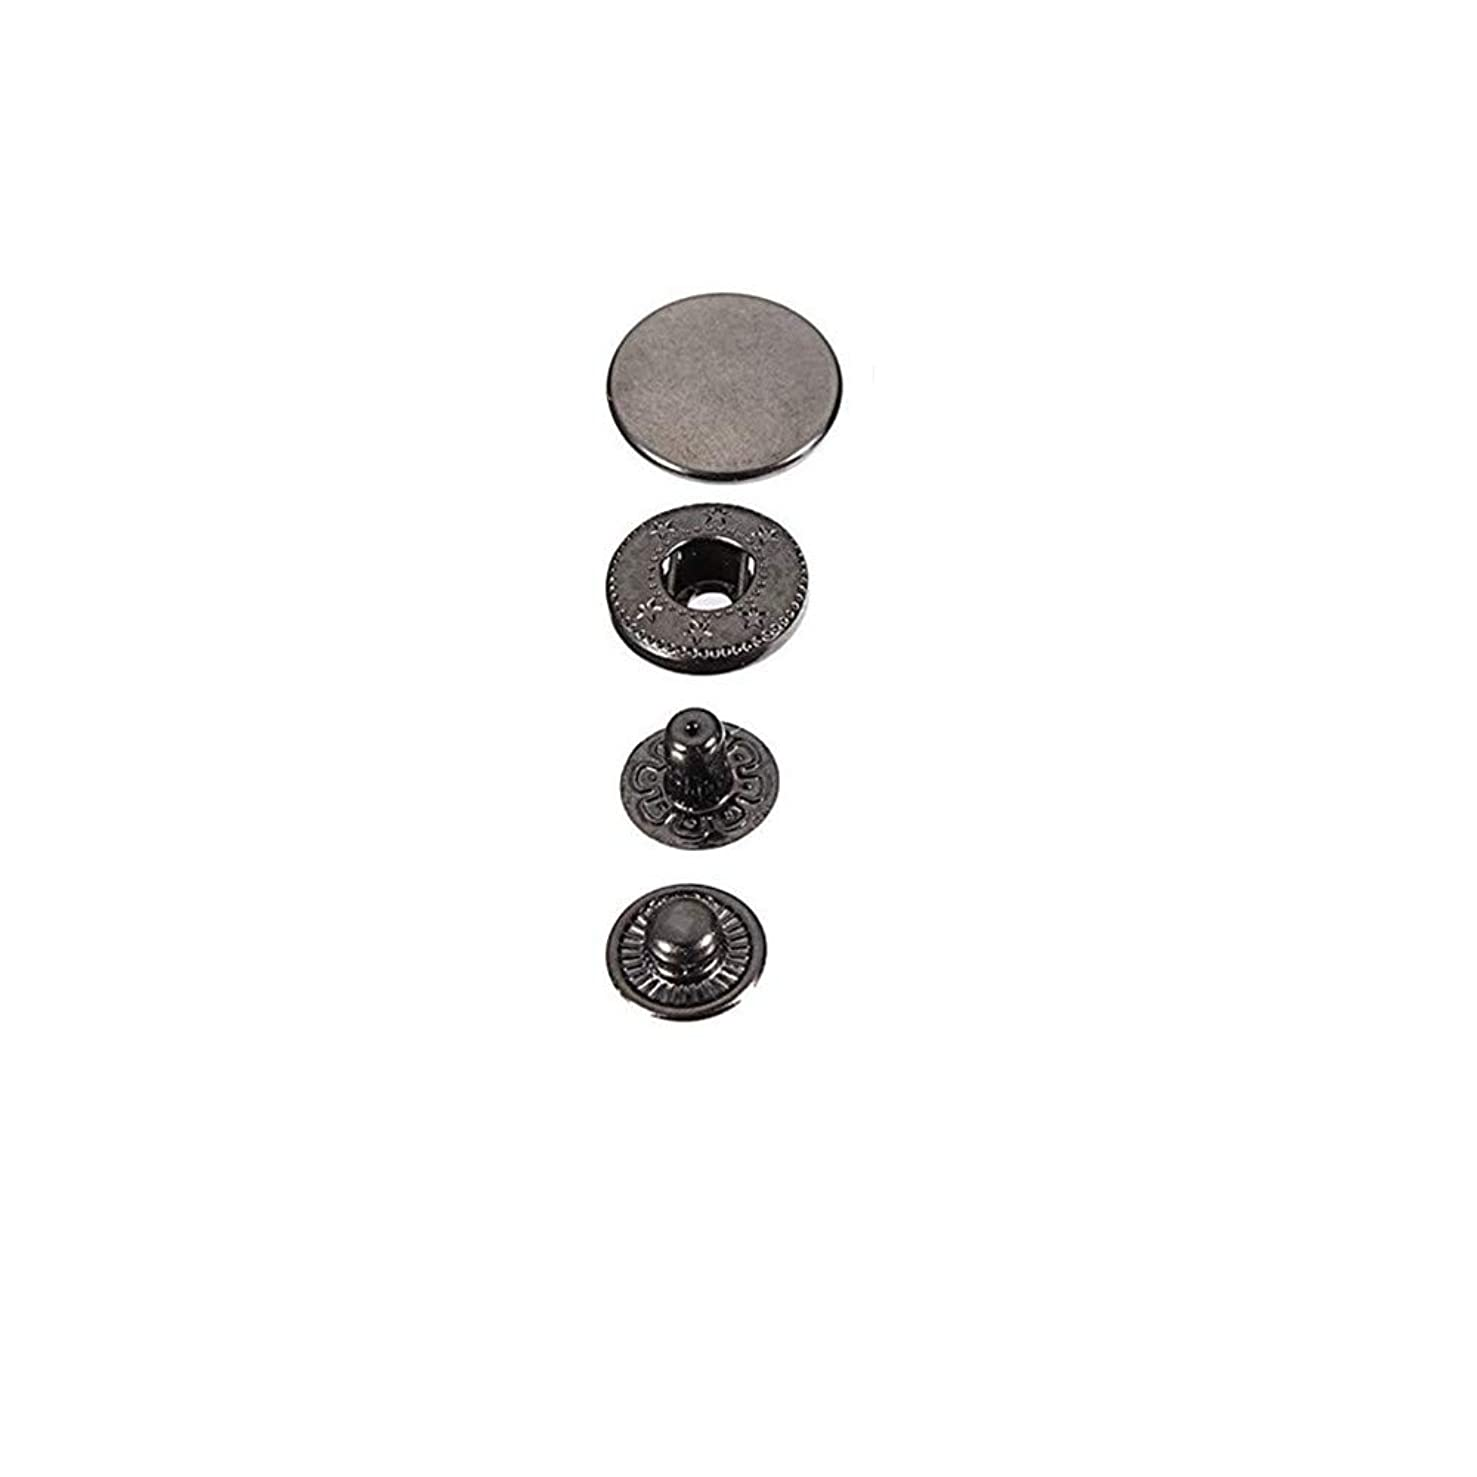 DIY Metal Snap Fasteners Leather Snaps Button Press Studs Pack of 50 Sets (15mm, Gun Metal/Black)